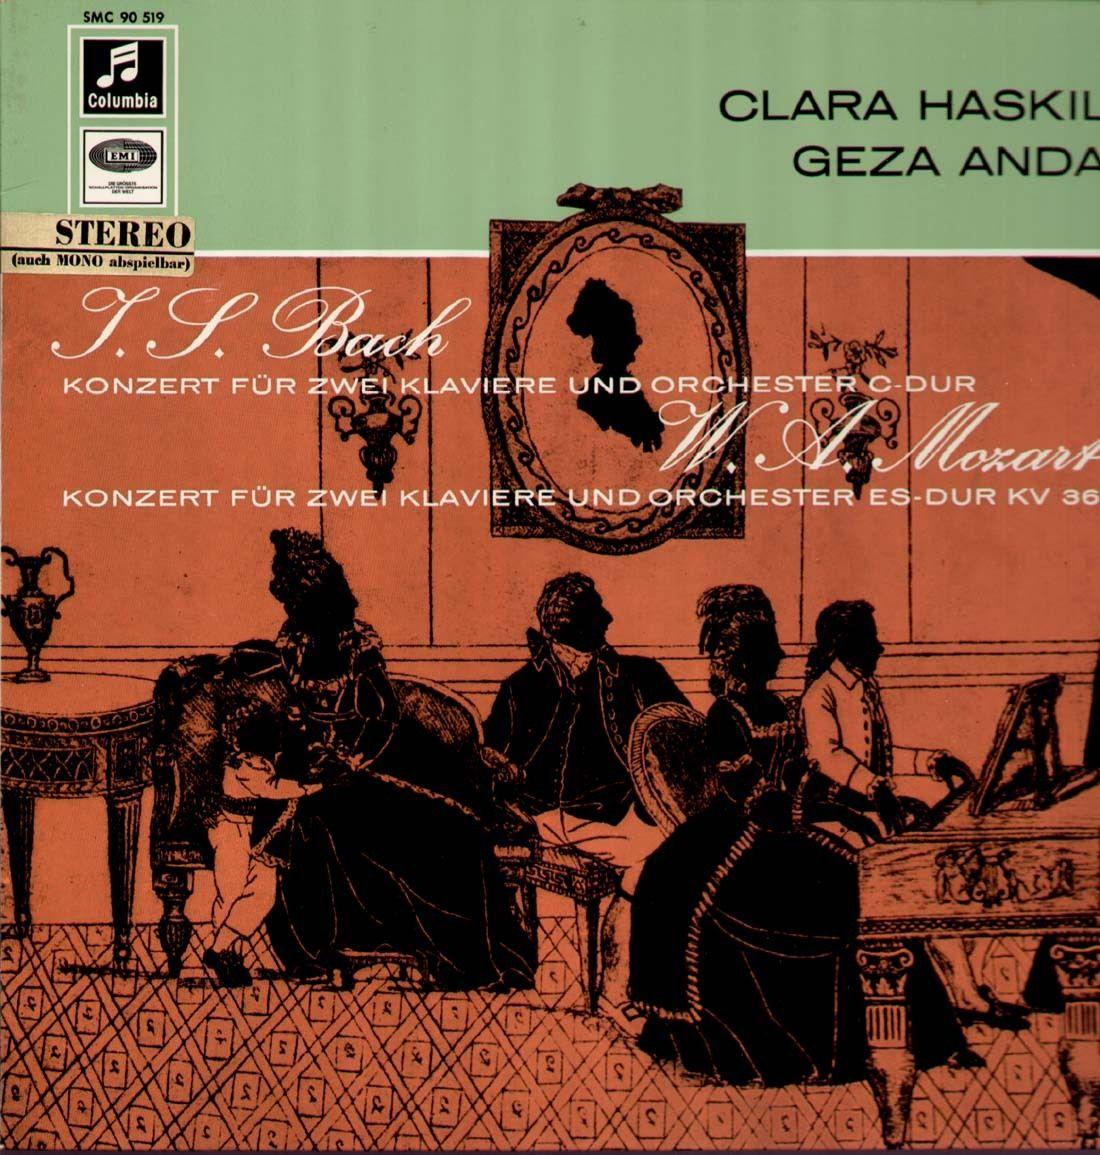 Haskil, Anda: Konzerte für 2 Klavier, Bach Mozart